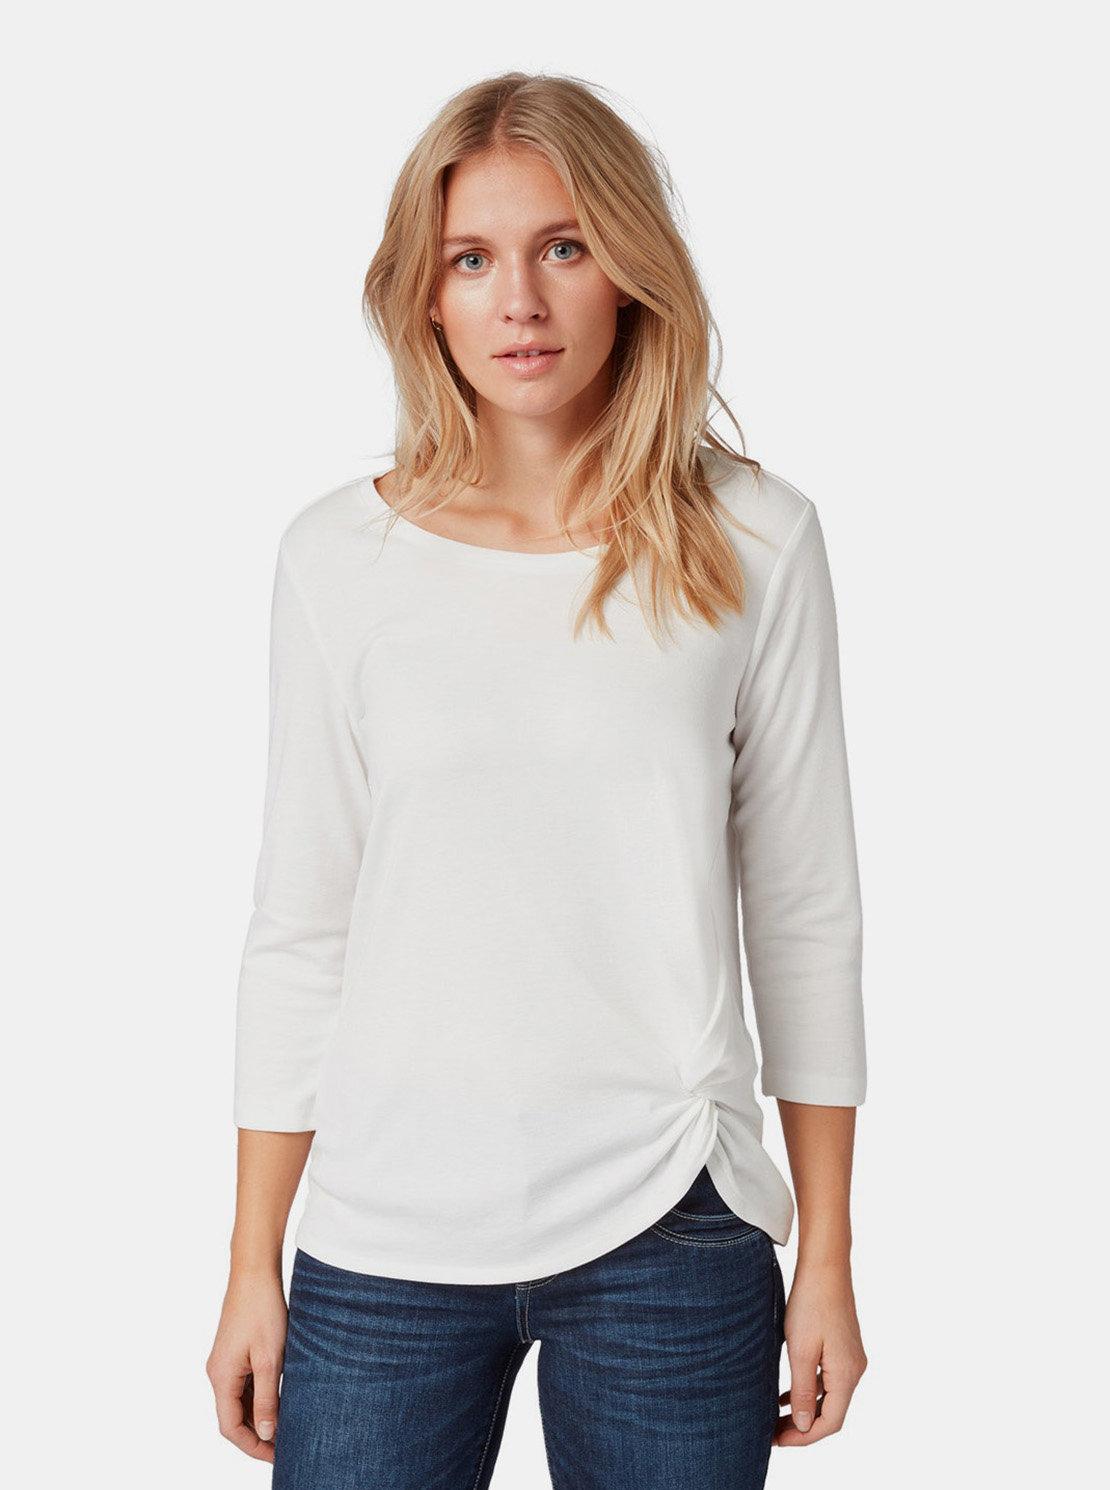 Bílé dámské tričko s řasením na boku Tom Tailor ... 0ffad9f5c6